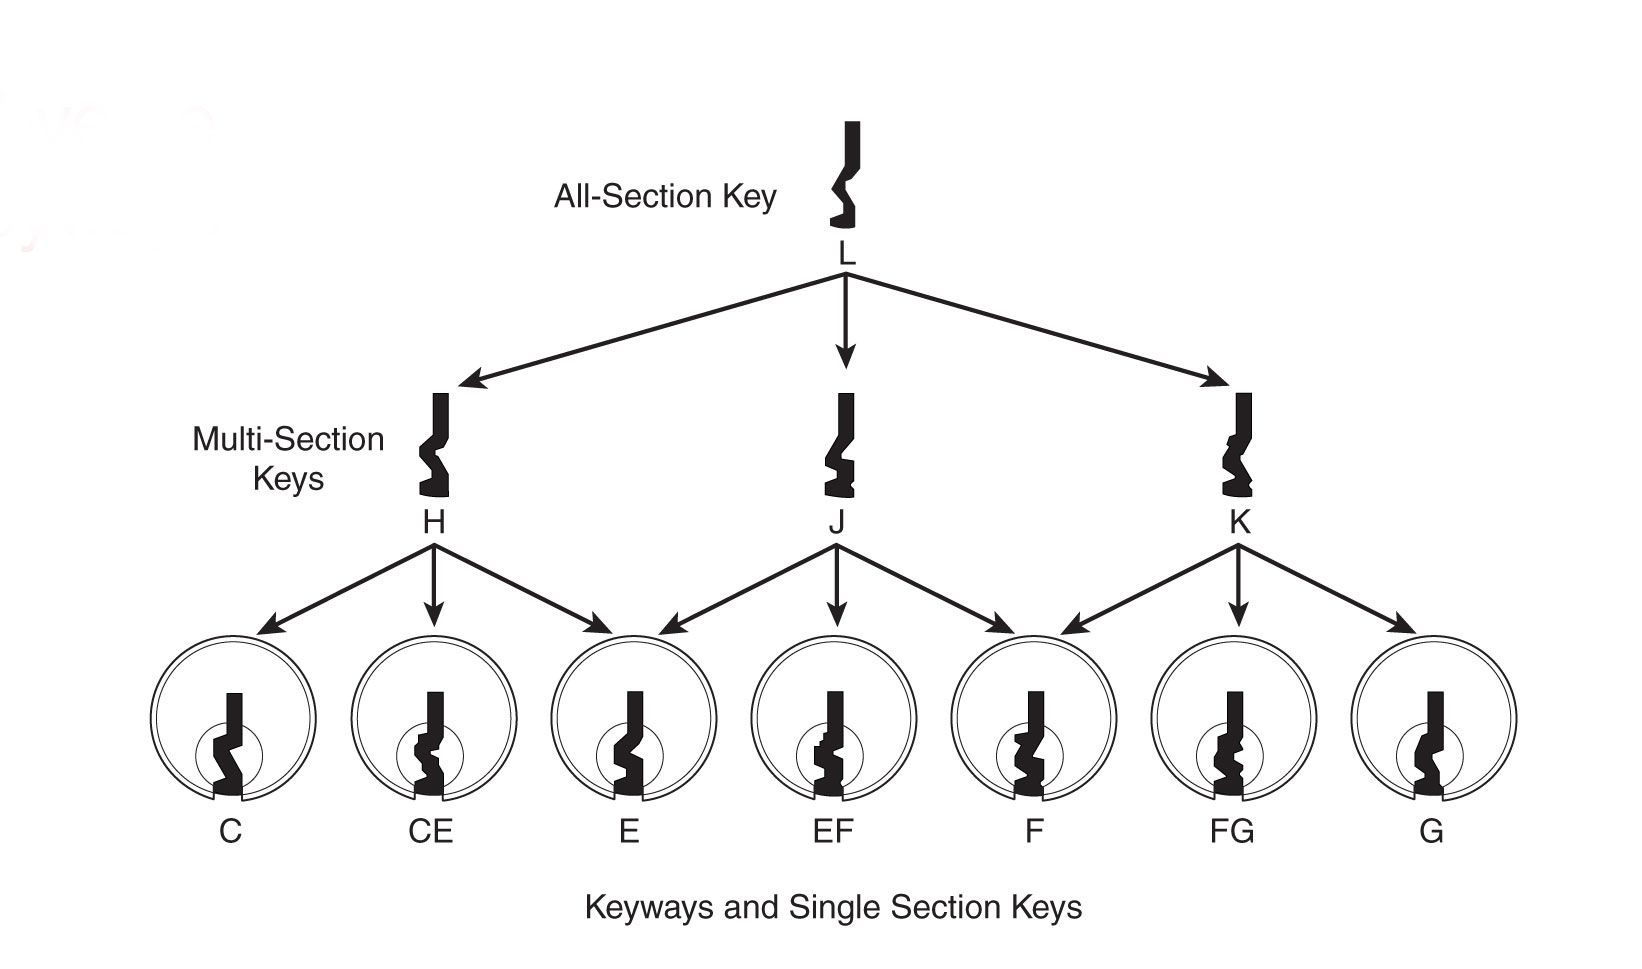 schlage classic keyways and single section keys diagram mr locksmith  [ 1642 x 969 Pixel ]